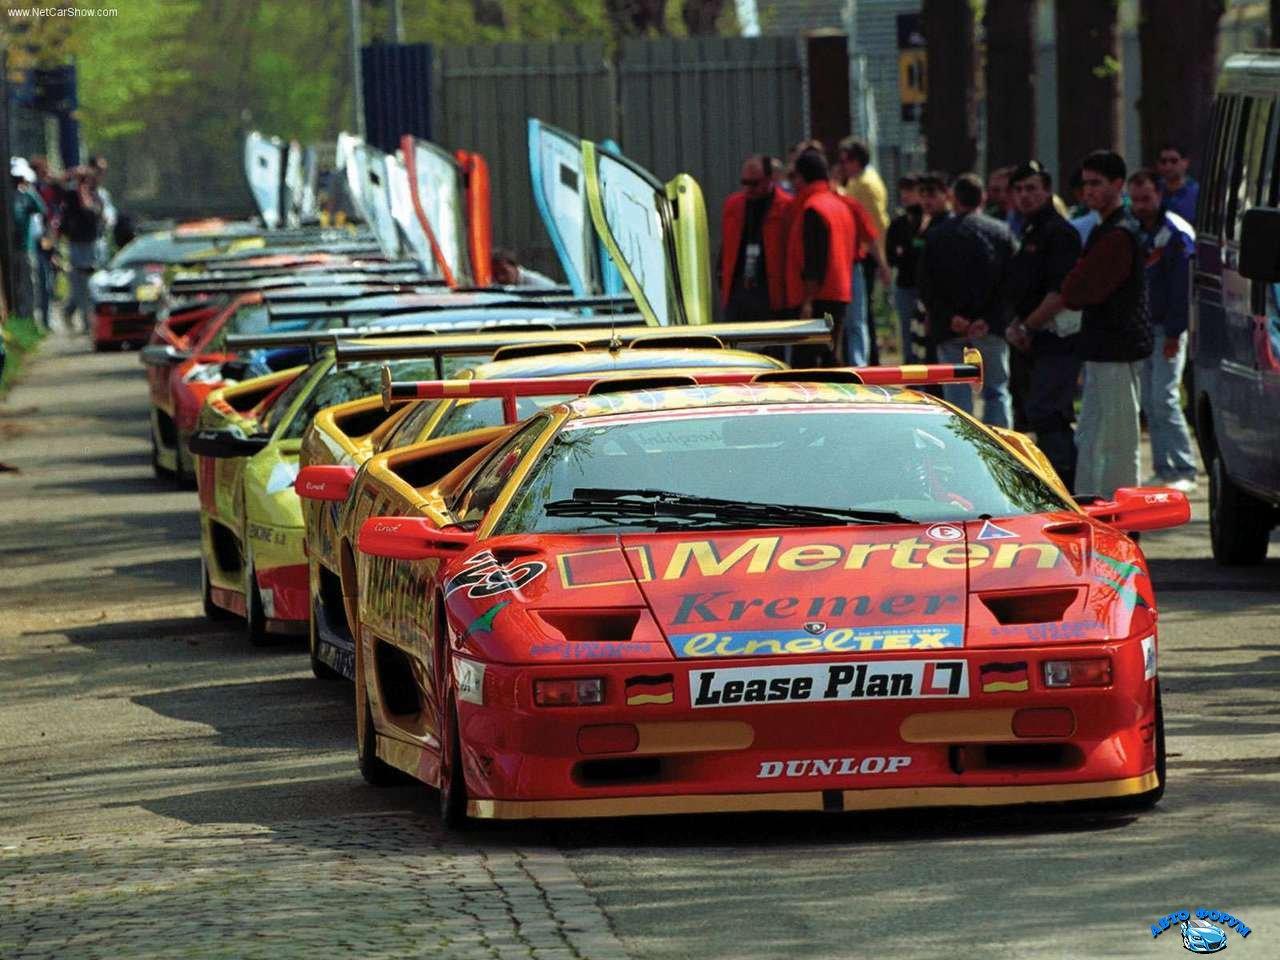 Lamborghini-Diablo_SVR_1996_1280x960_wallpaper_02.jpg